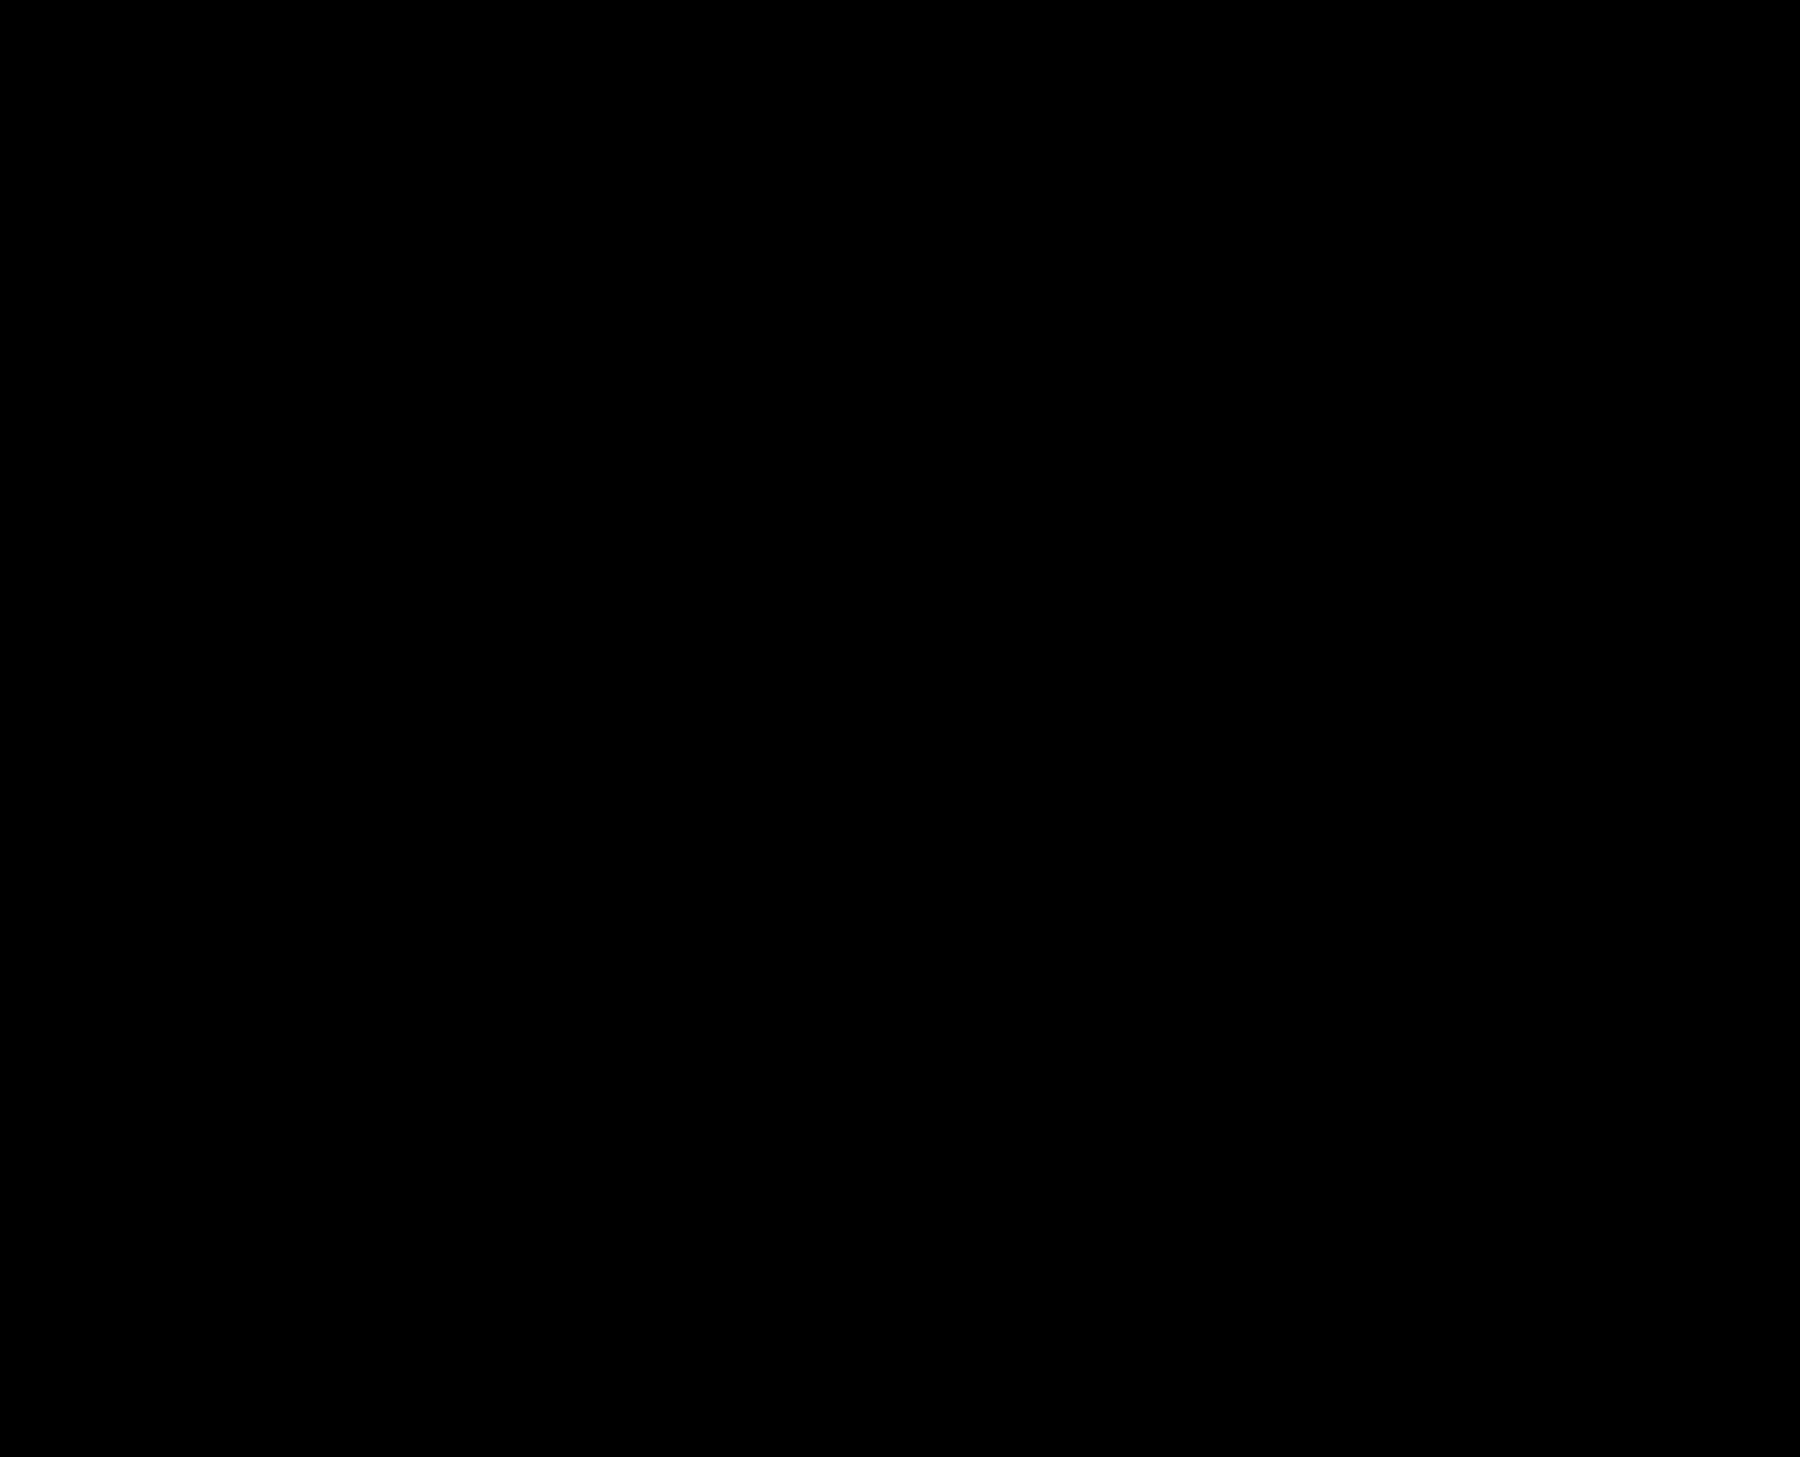 QUANTUM 2.0 BY ØRGREEN